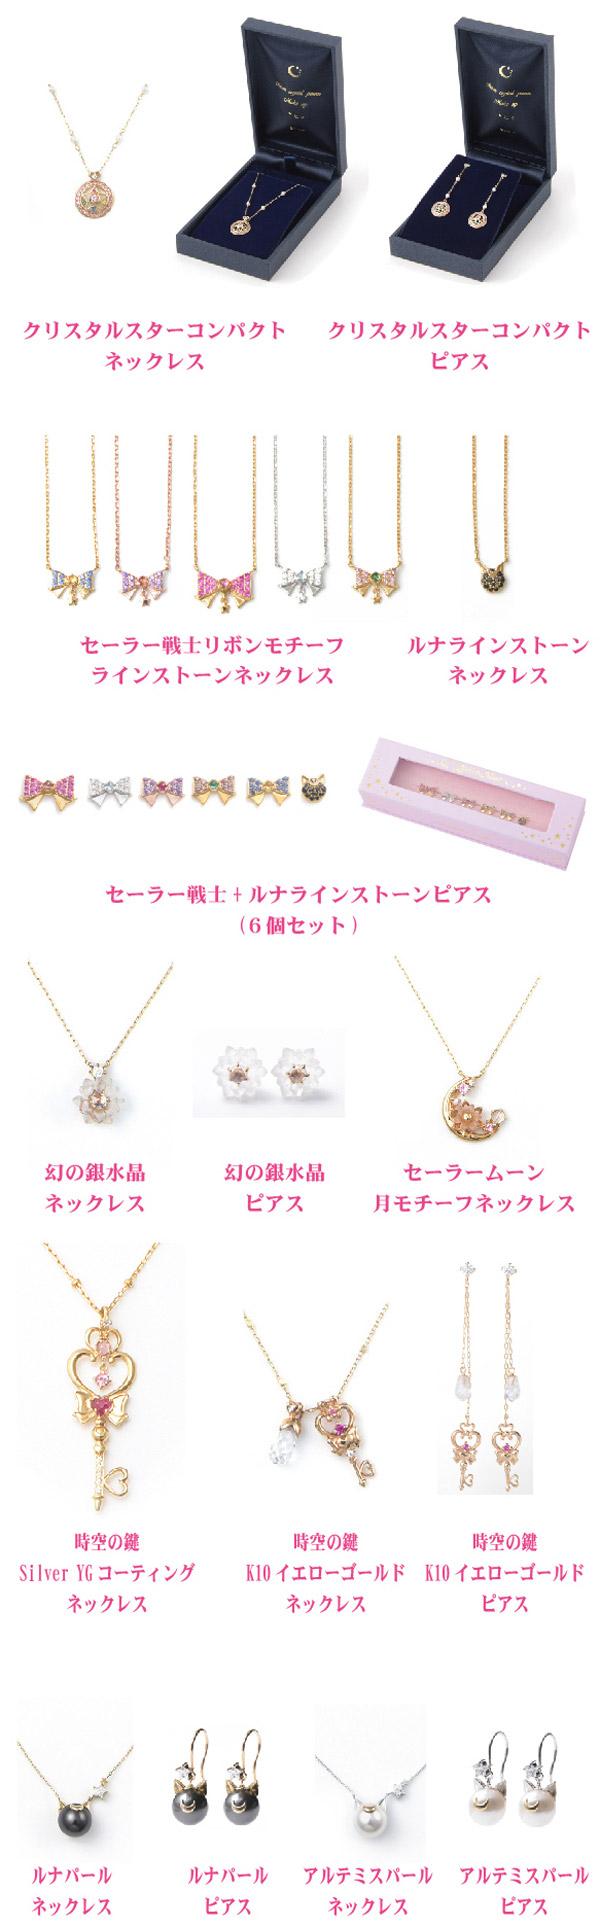 sailormoon-samantha-tiara-jewelry-collaboration-isetan-fashion2016